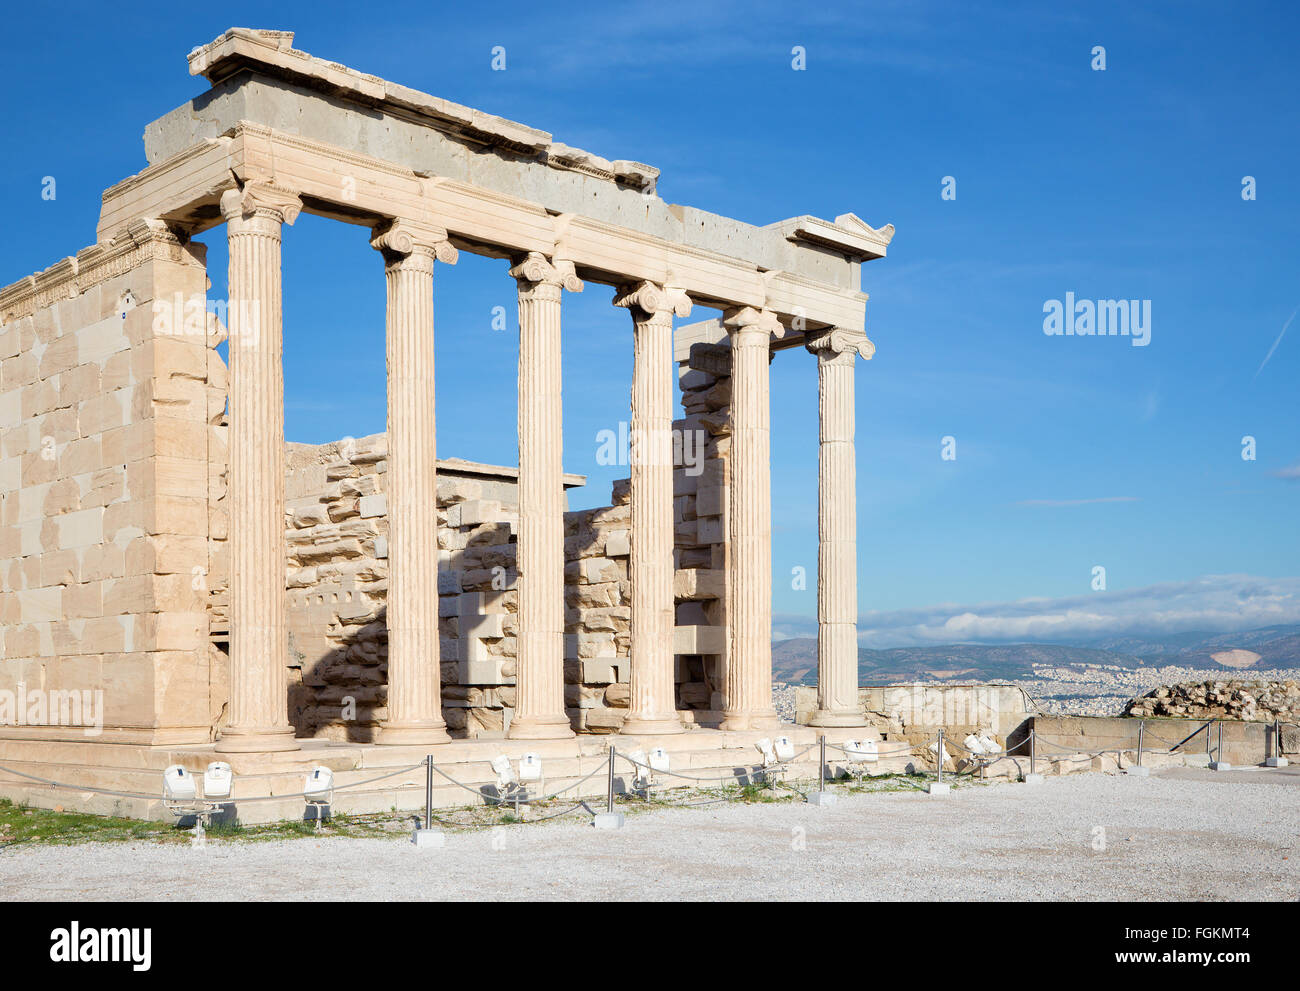 Athens - The Erechtheion on Acropolis in morning light. - Stock Image